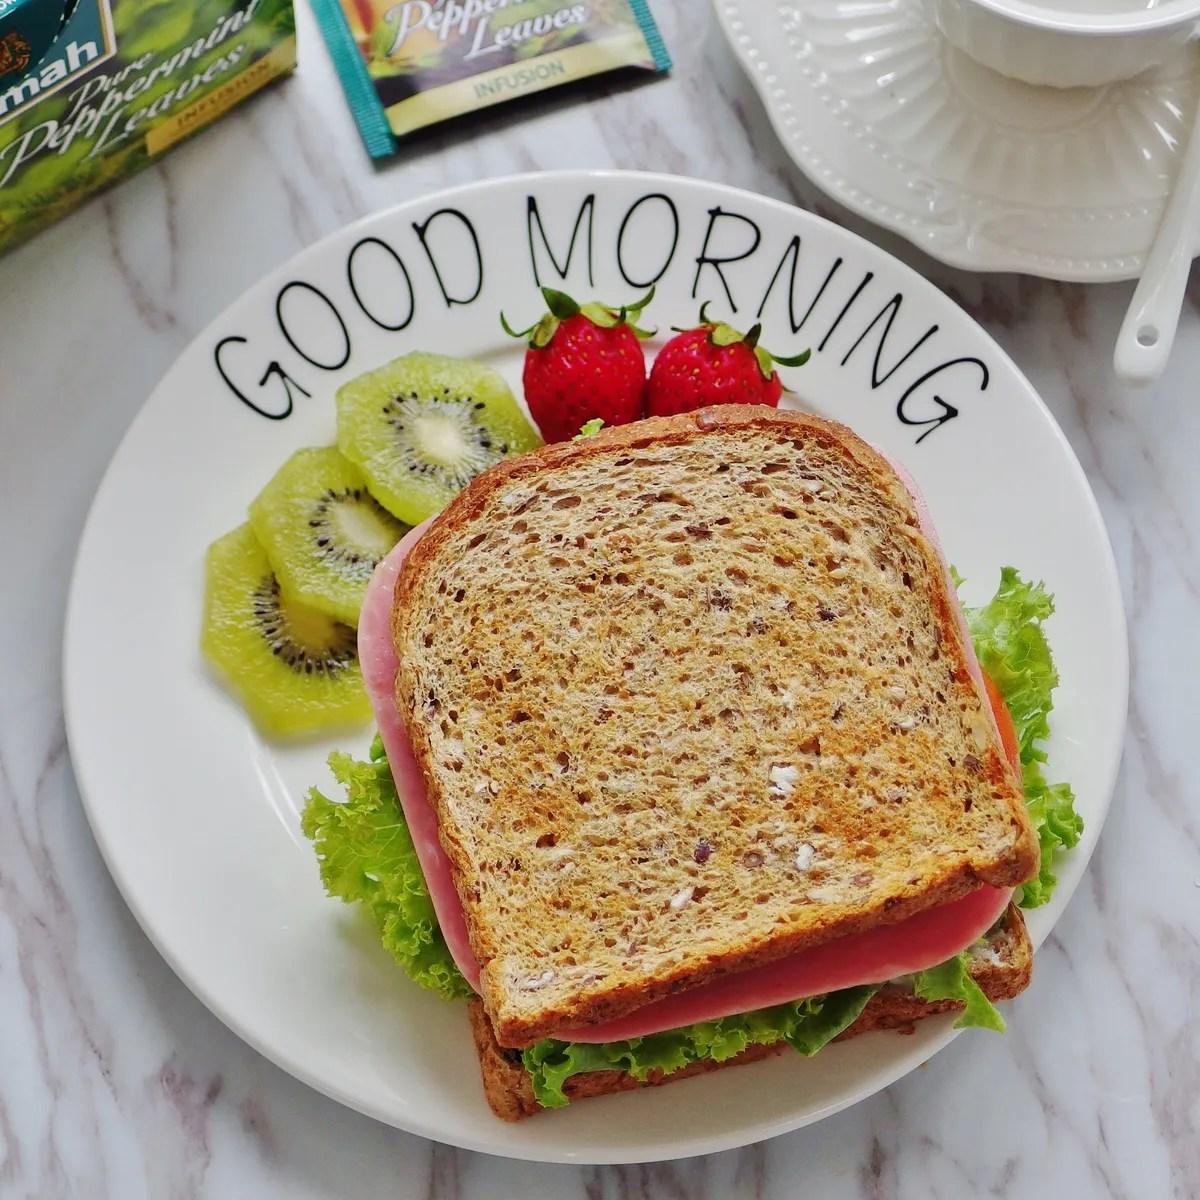 Insta-Worthy Healthy Breakfast Ideas